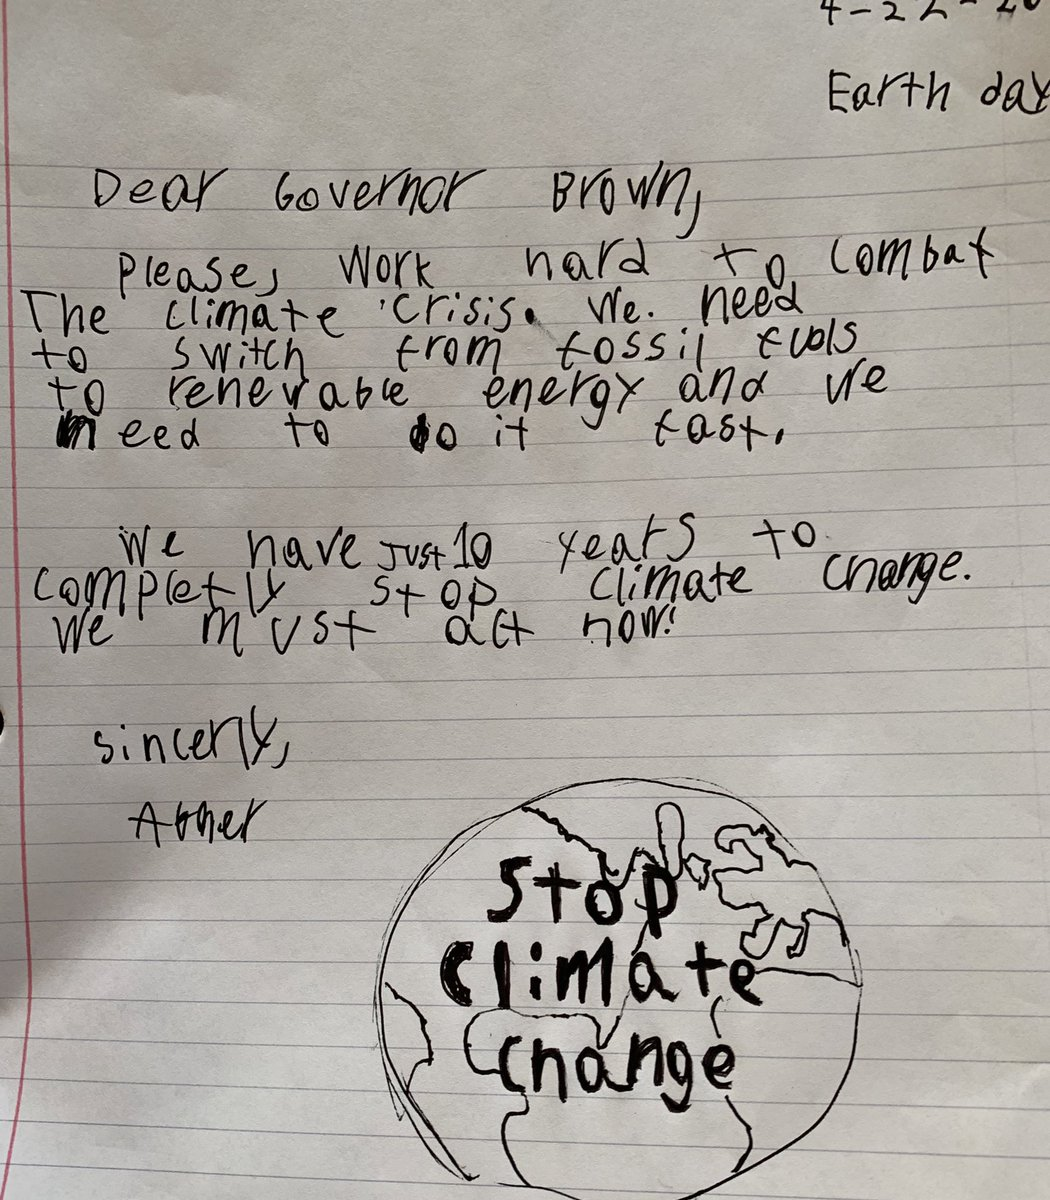 Happy Earth Day @OregonGovBrown! Letter 131 #EarthDay2020 #EarthDayAtHome #EarthDay